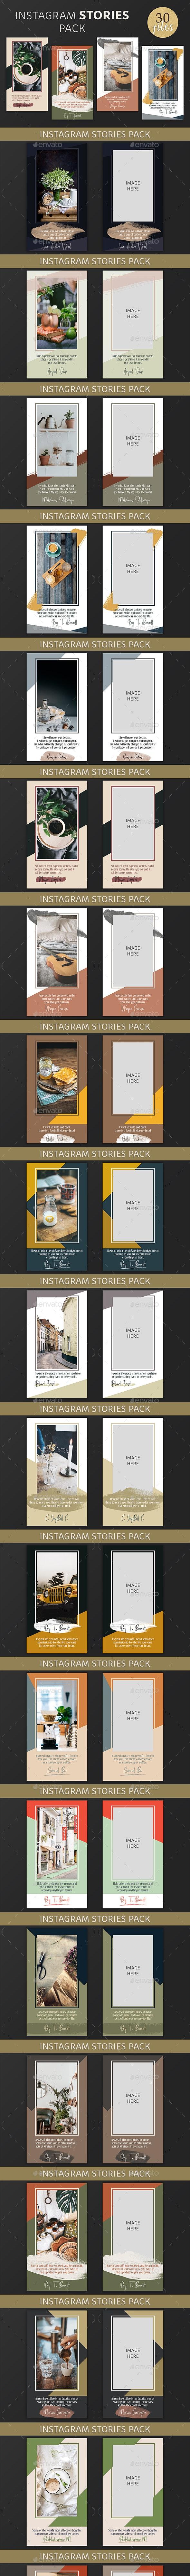 Instagram Stories Pack - Social Media Web Elements